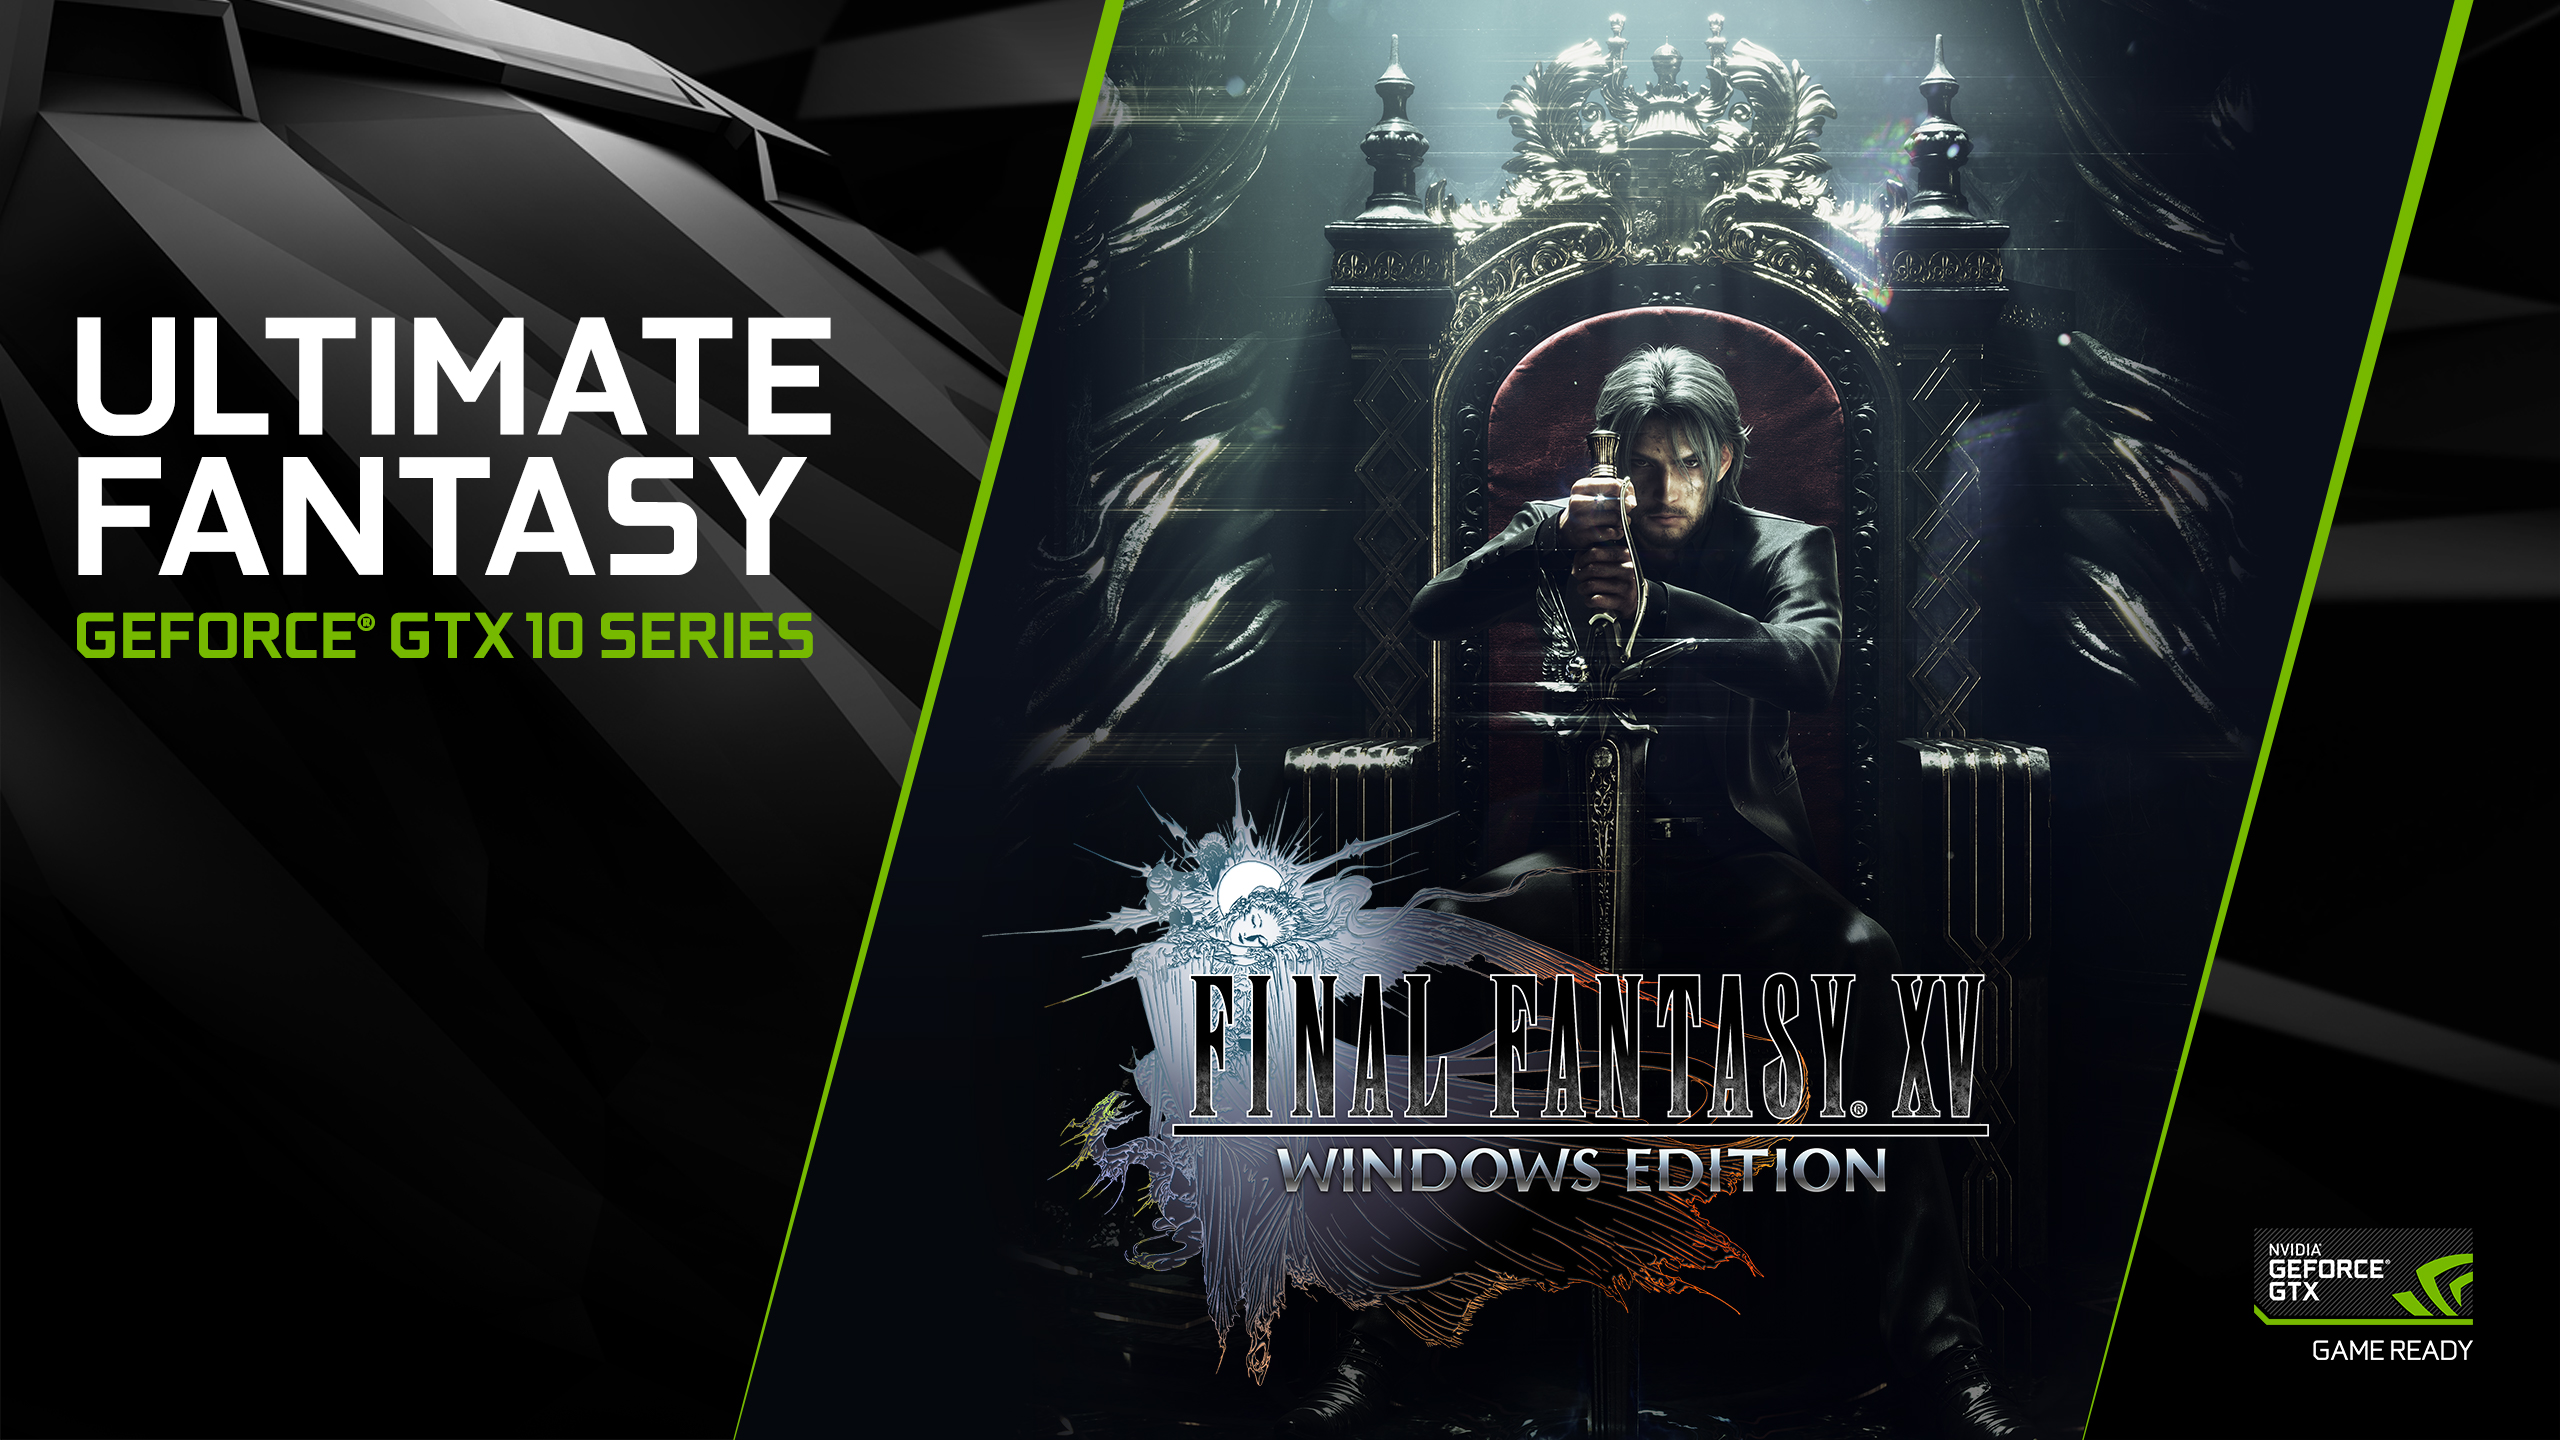 Windows ベンチマーク edition fantasy final xv